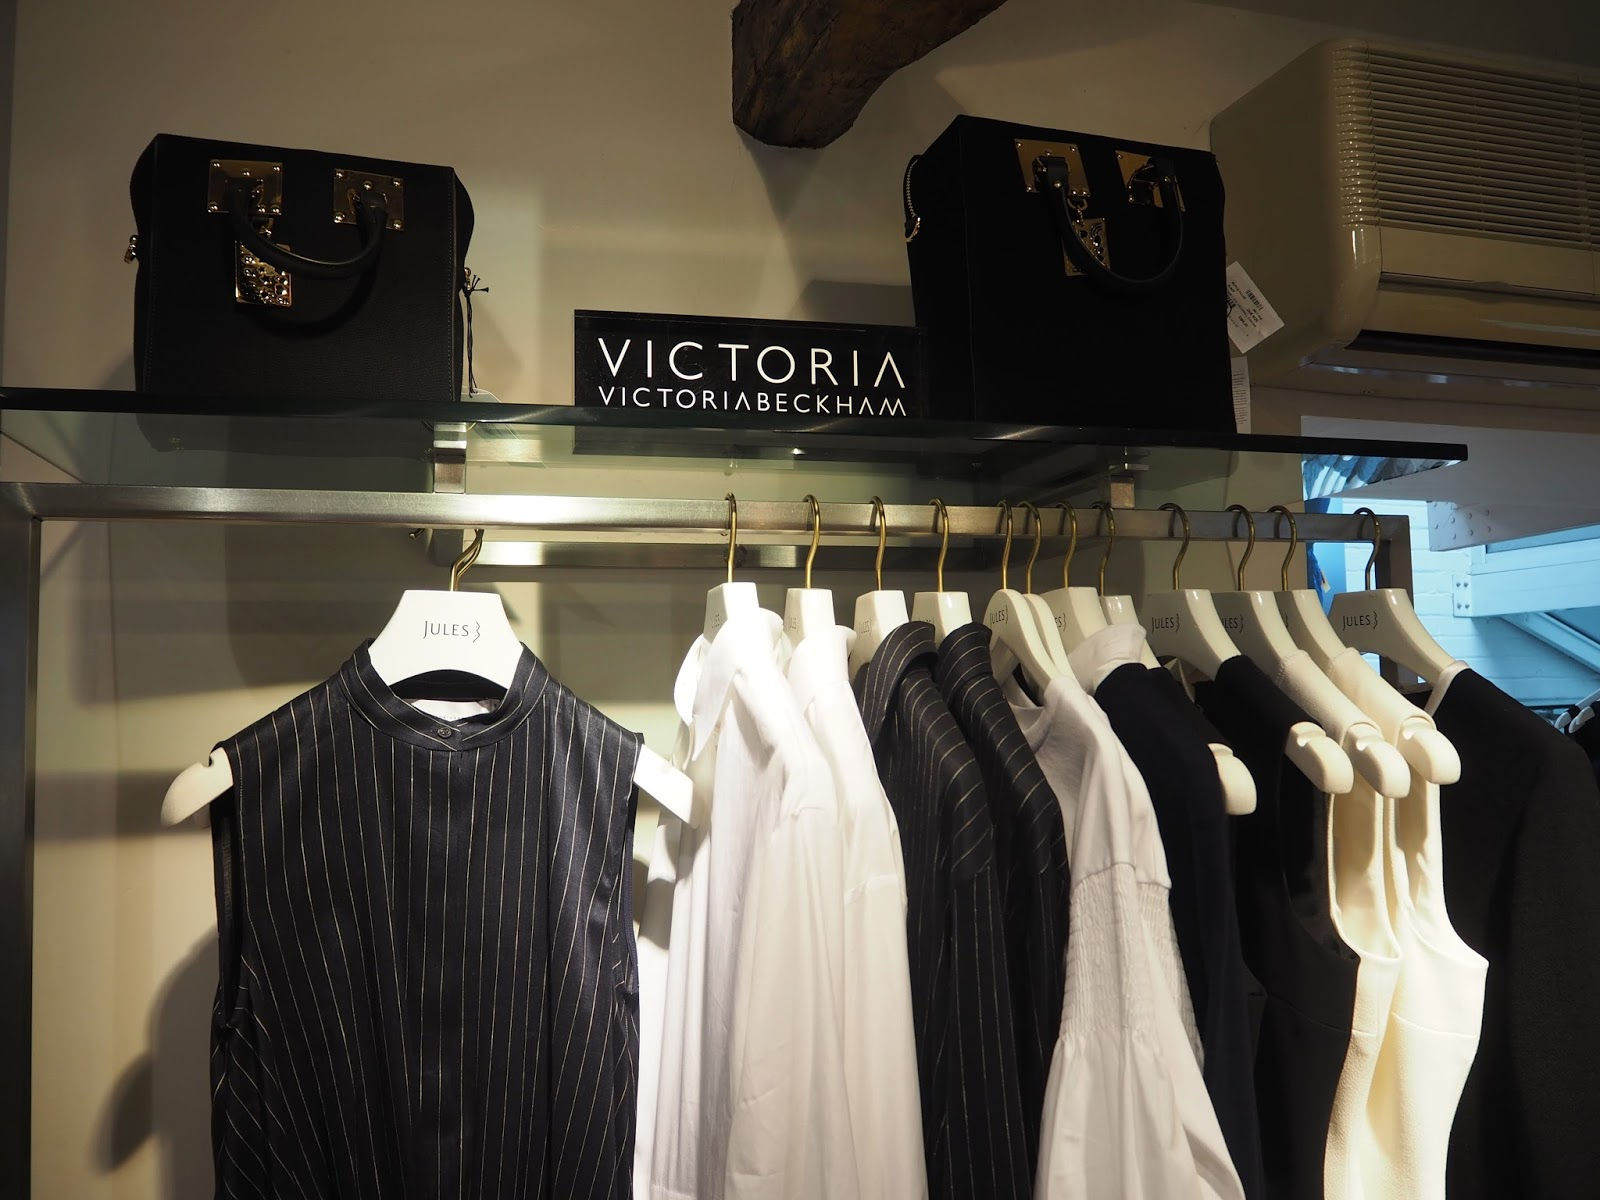 Victoria Beckham at Jules B, Kendal